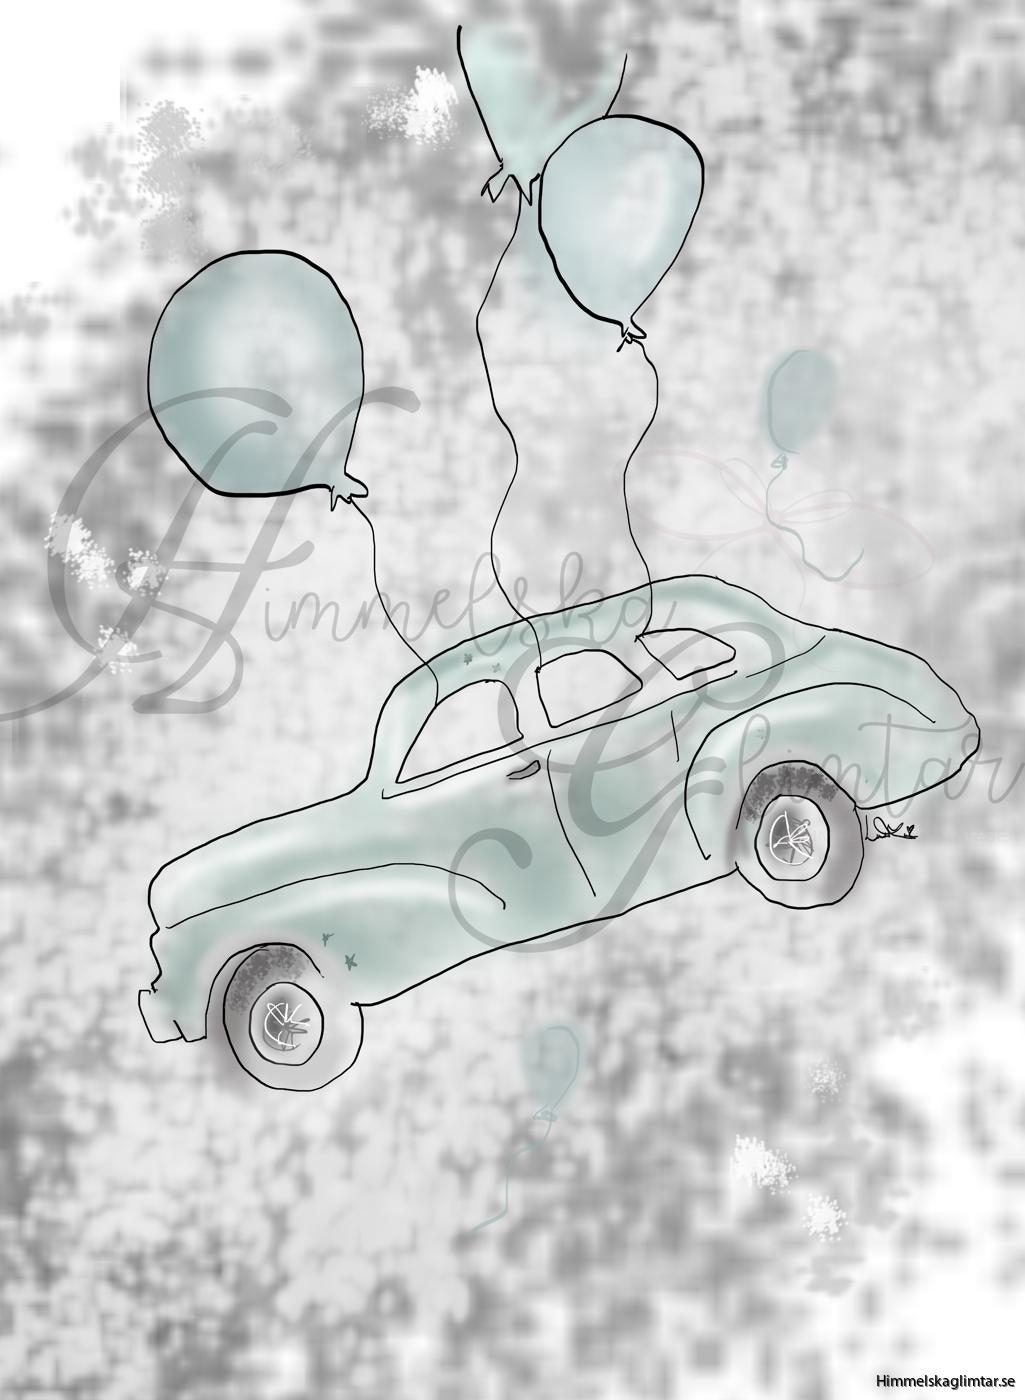 bilenochballongen kopia